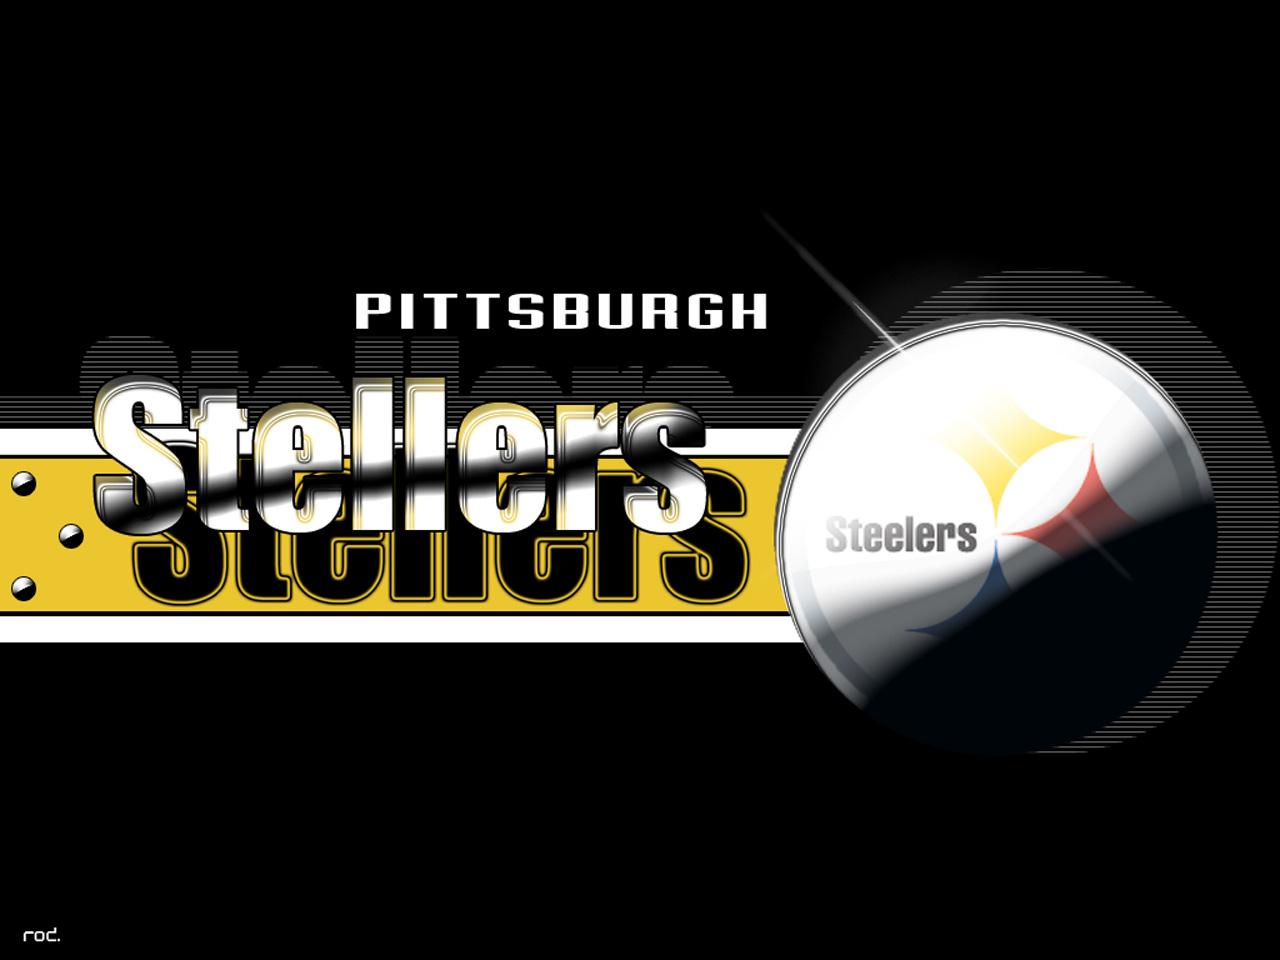 Disfruta De Pittsburgh Steelers Wallpaper Hd cute Wallpapers 1280x960